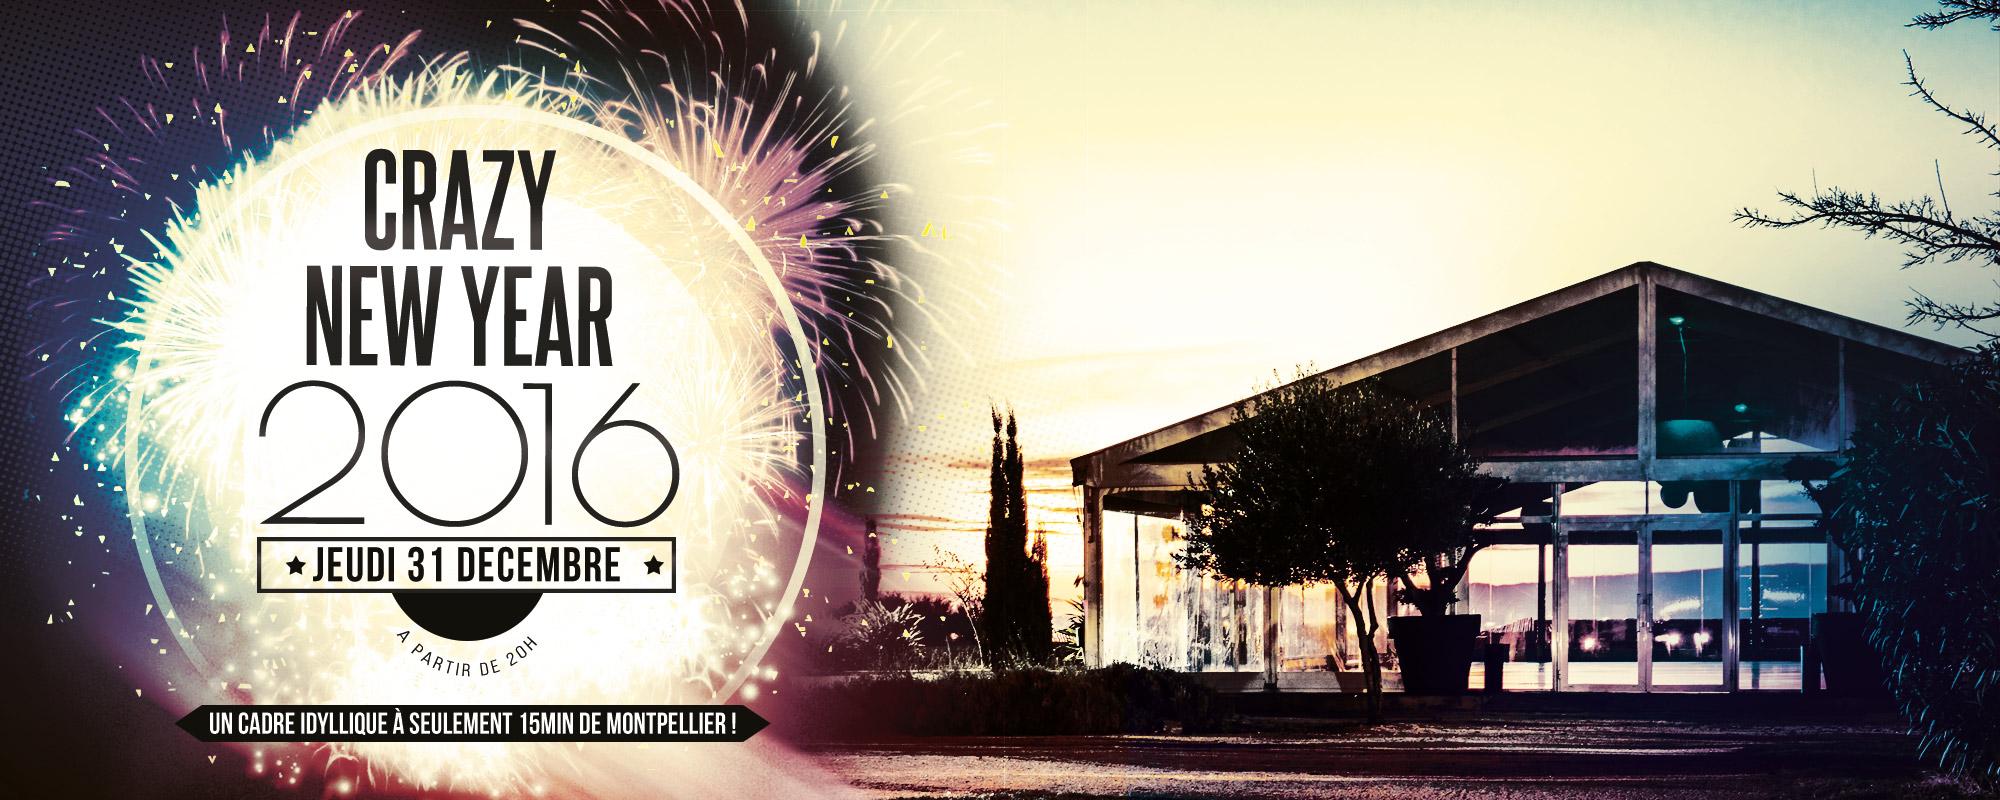 Réveillon Montpellier 2016